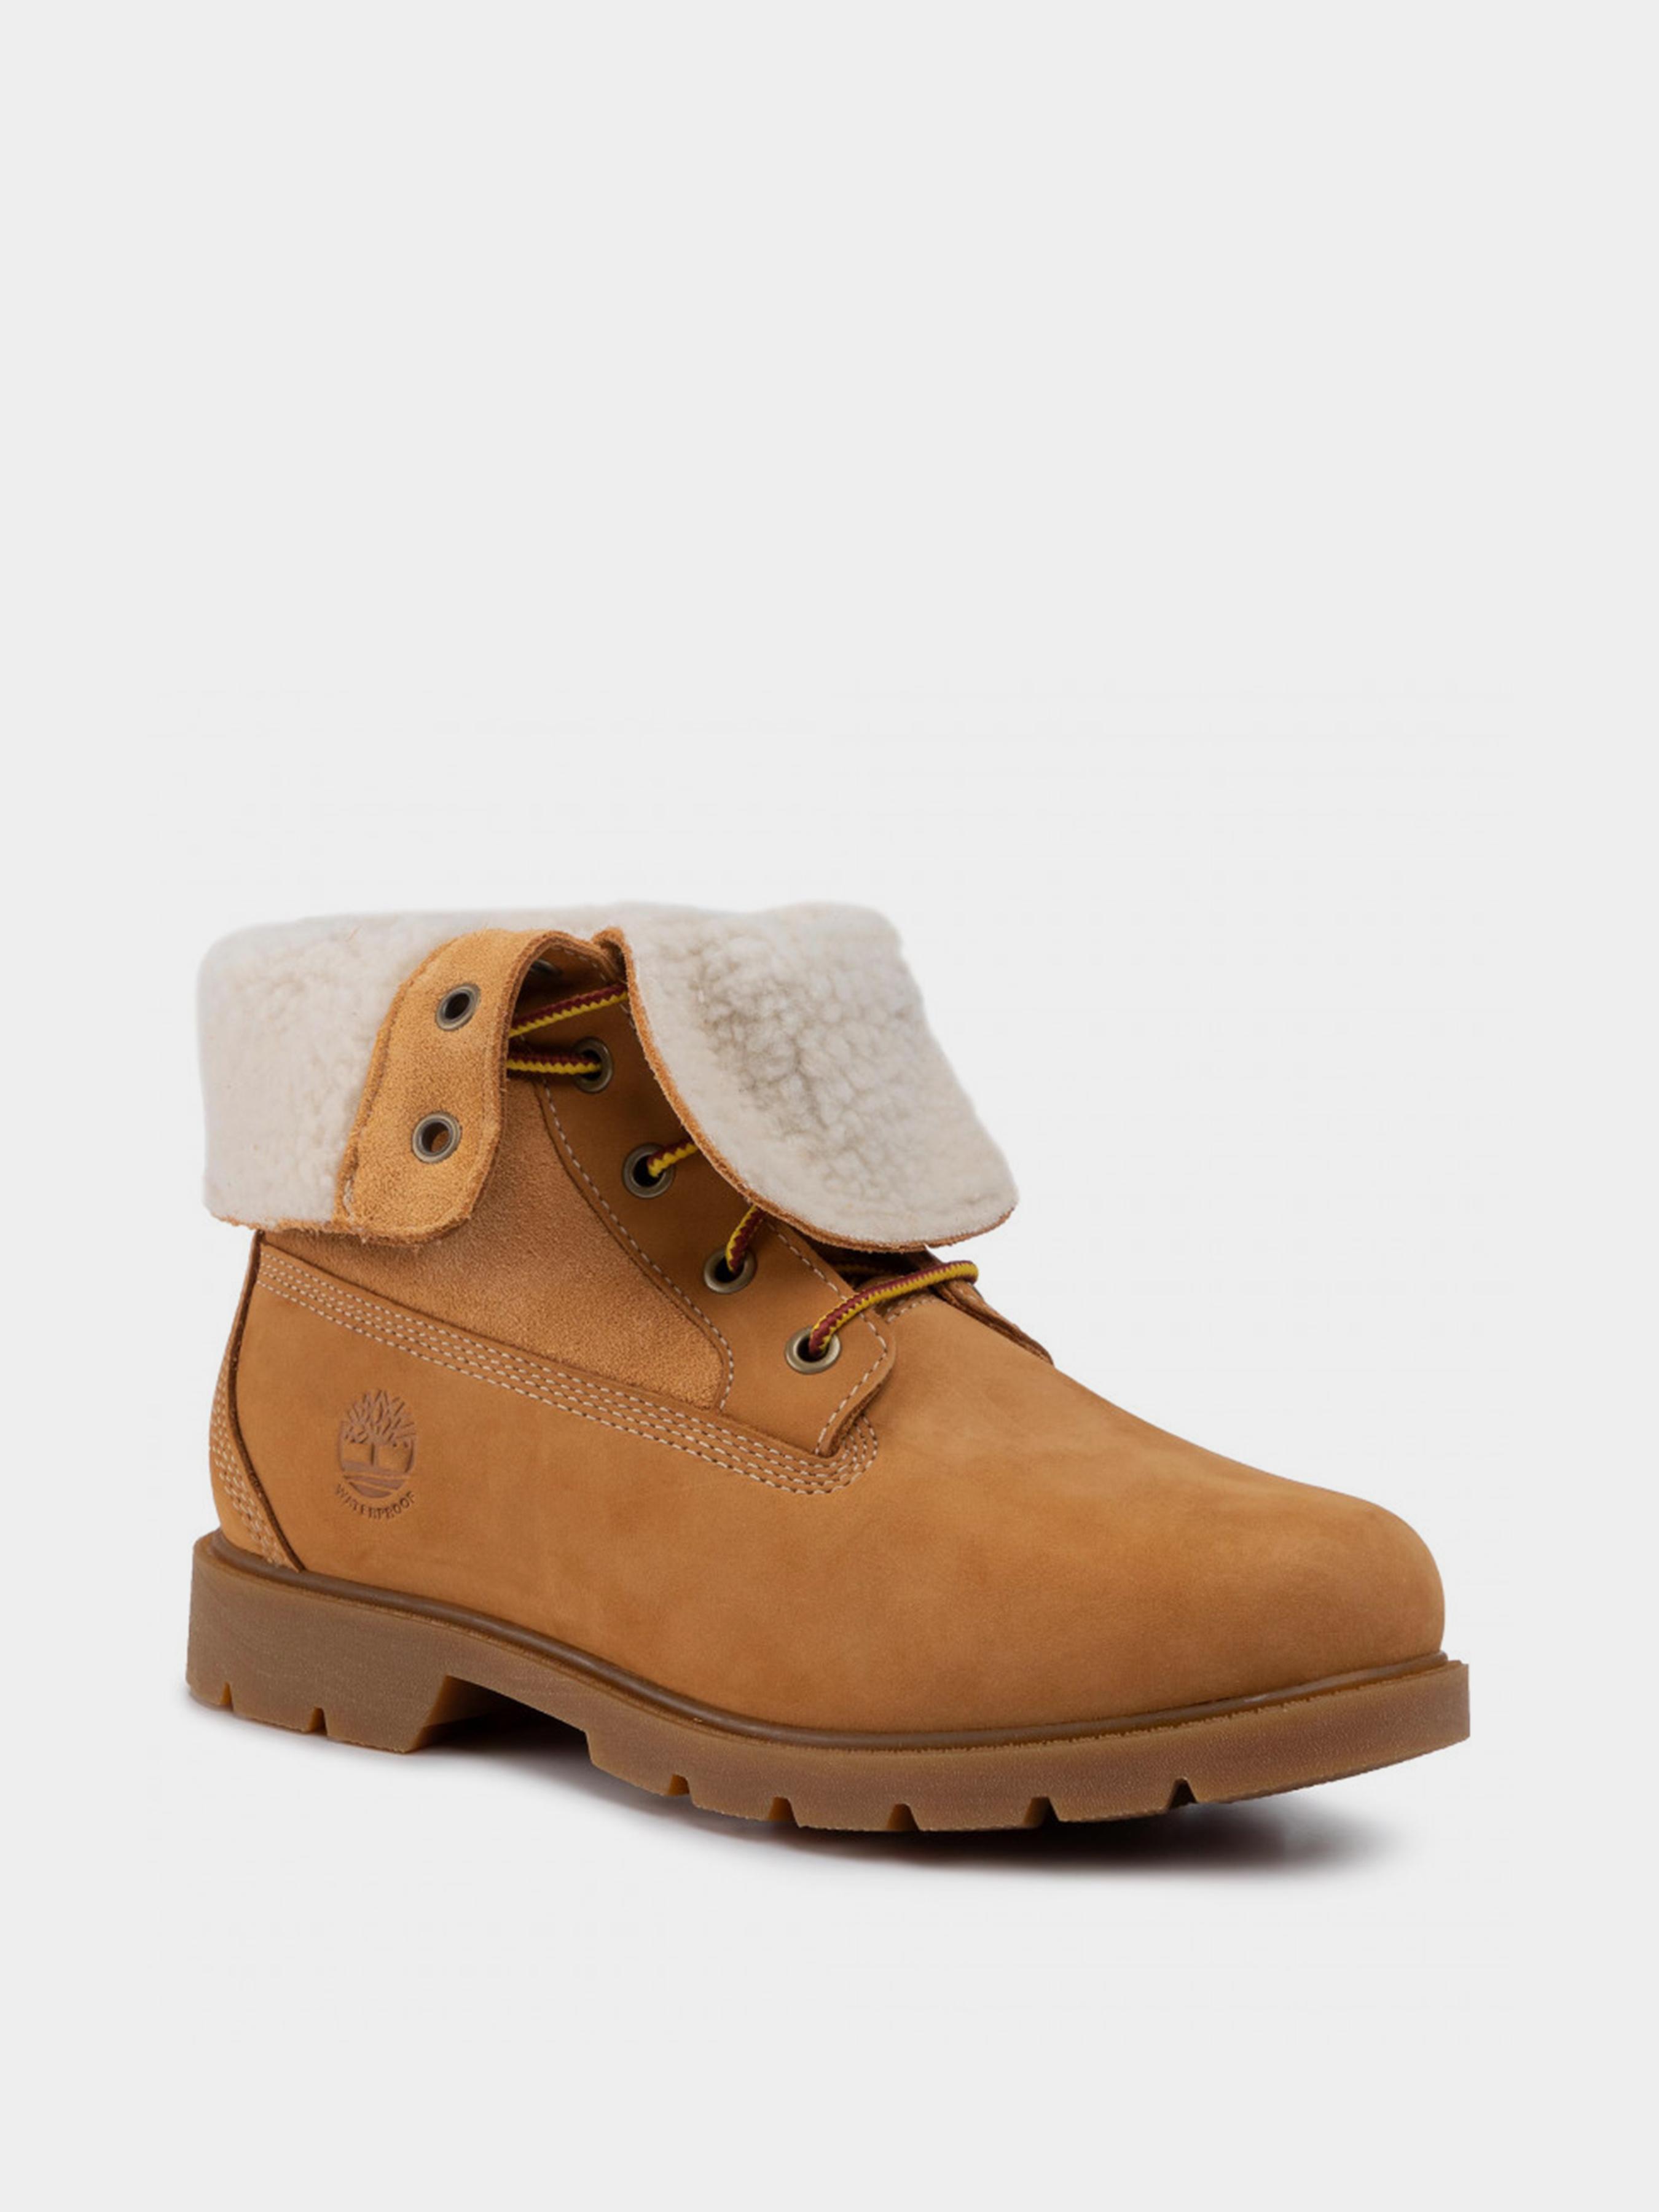 Ботинки для женщин Timberland Iconic Classics TG2347 брендовая обувь, 2017